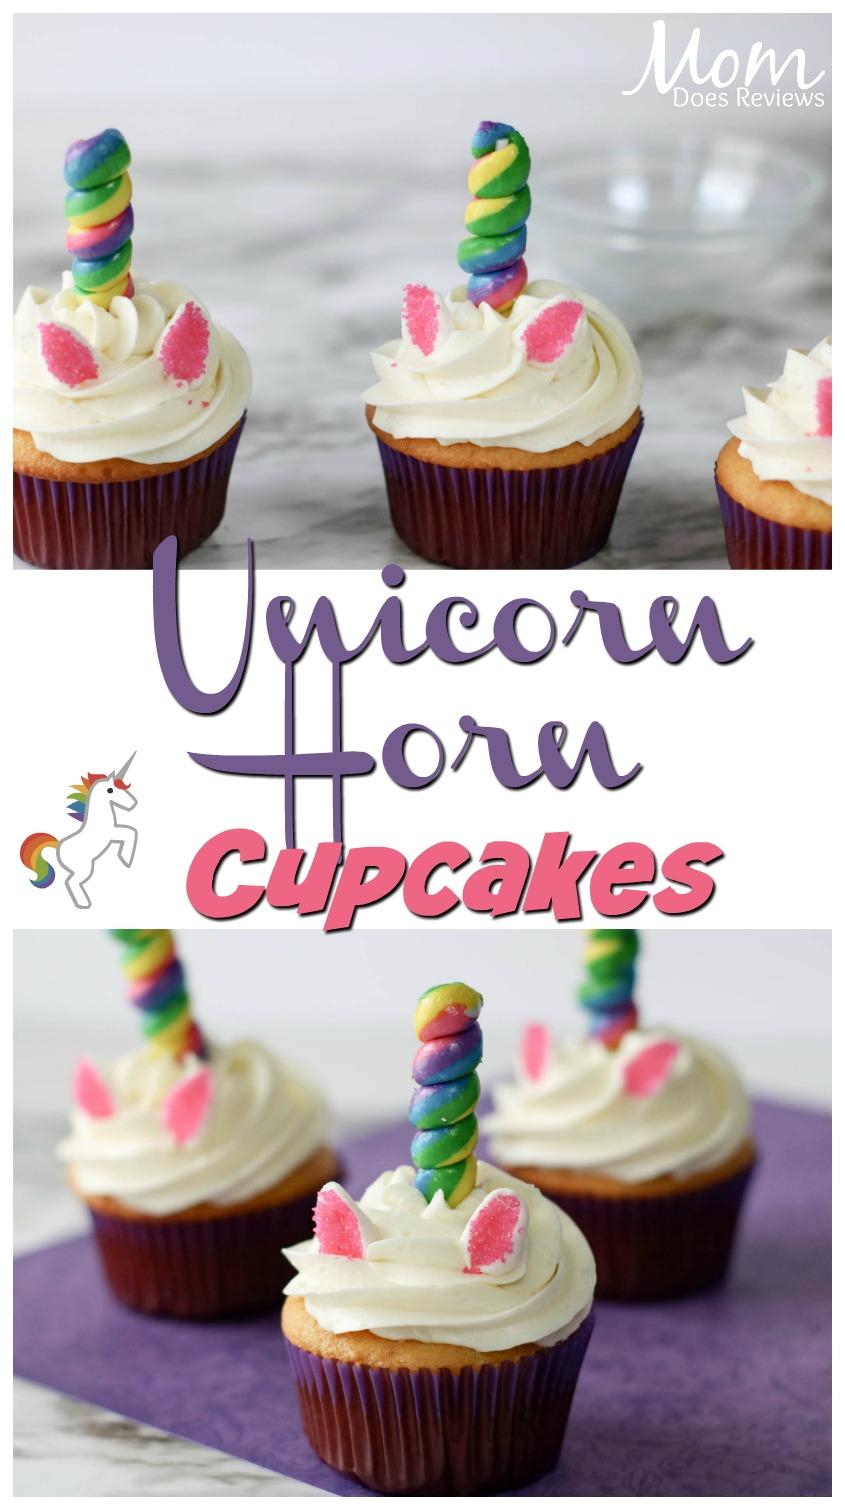 Unicorn Horn Cupcakes #funfood #cupcakes #desserts